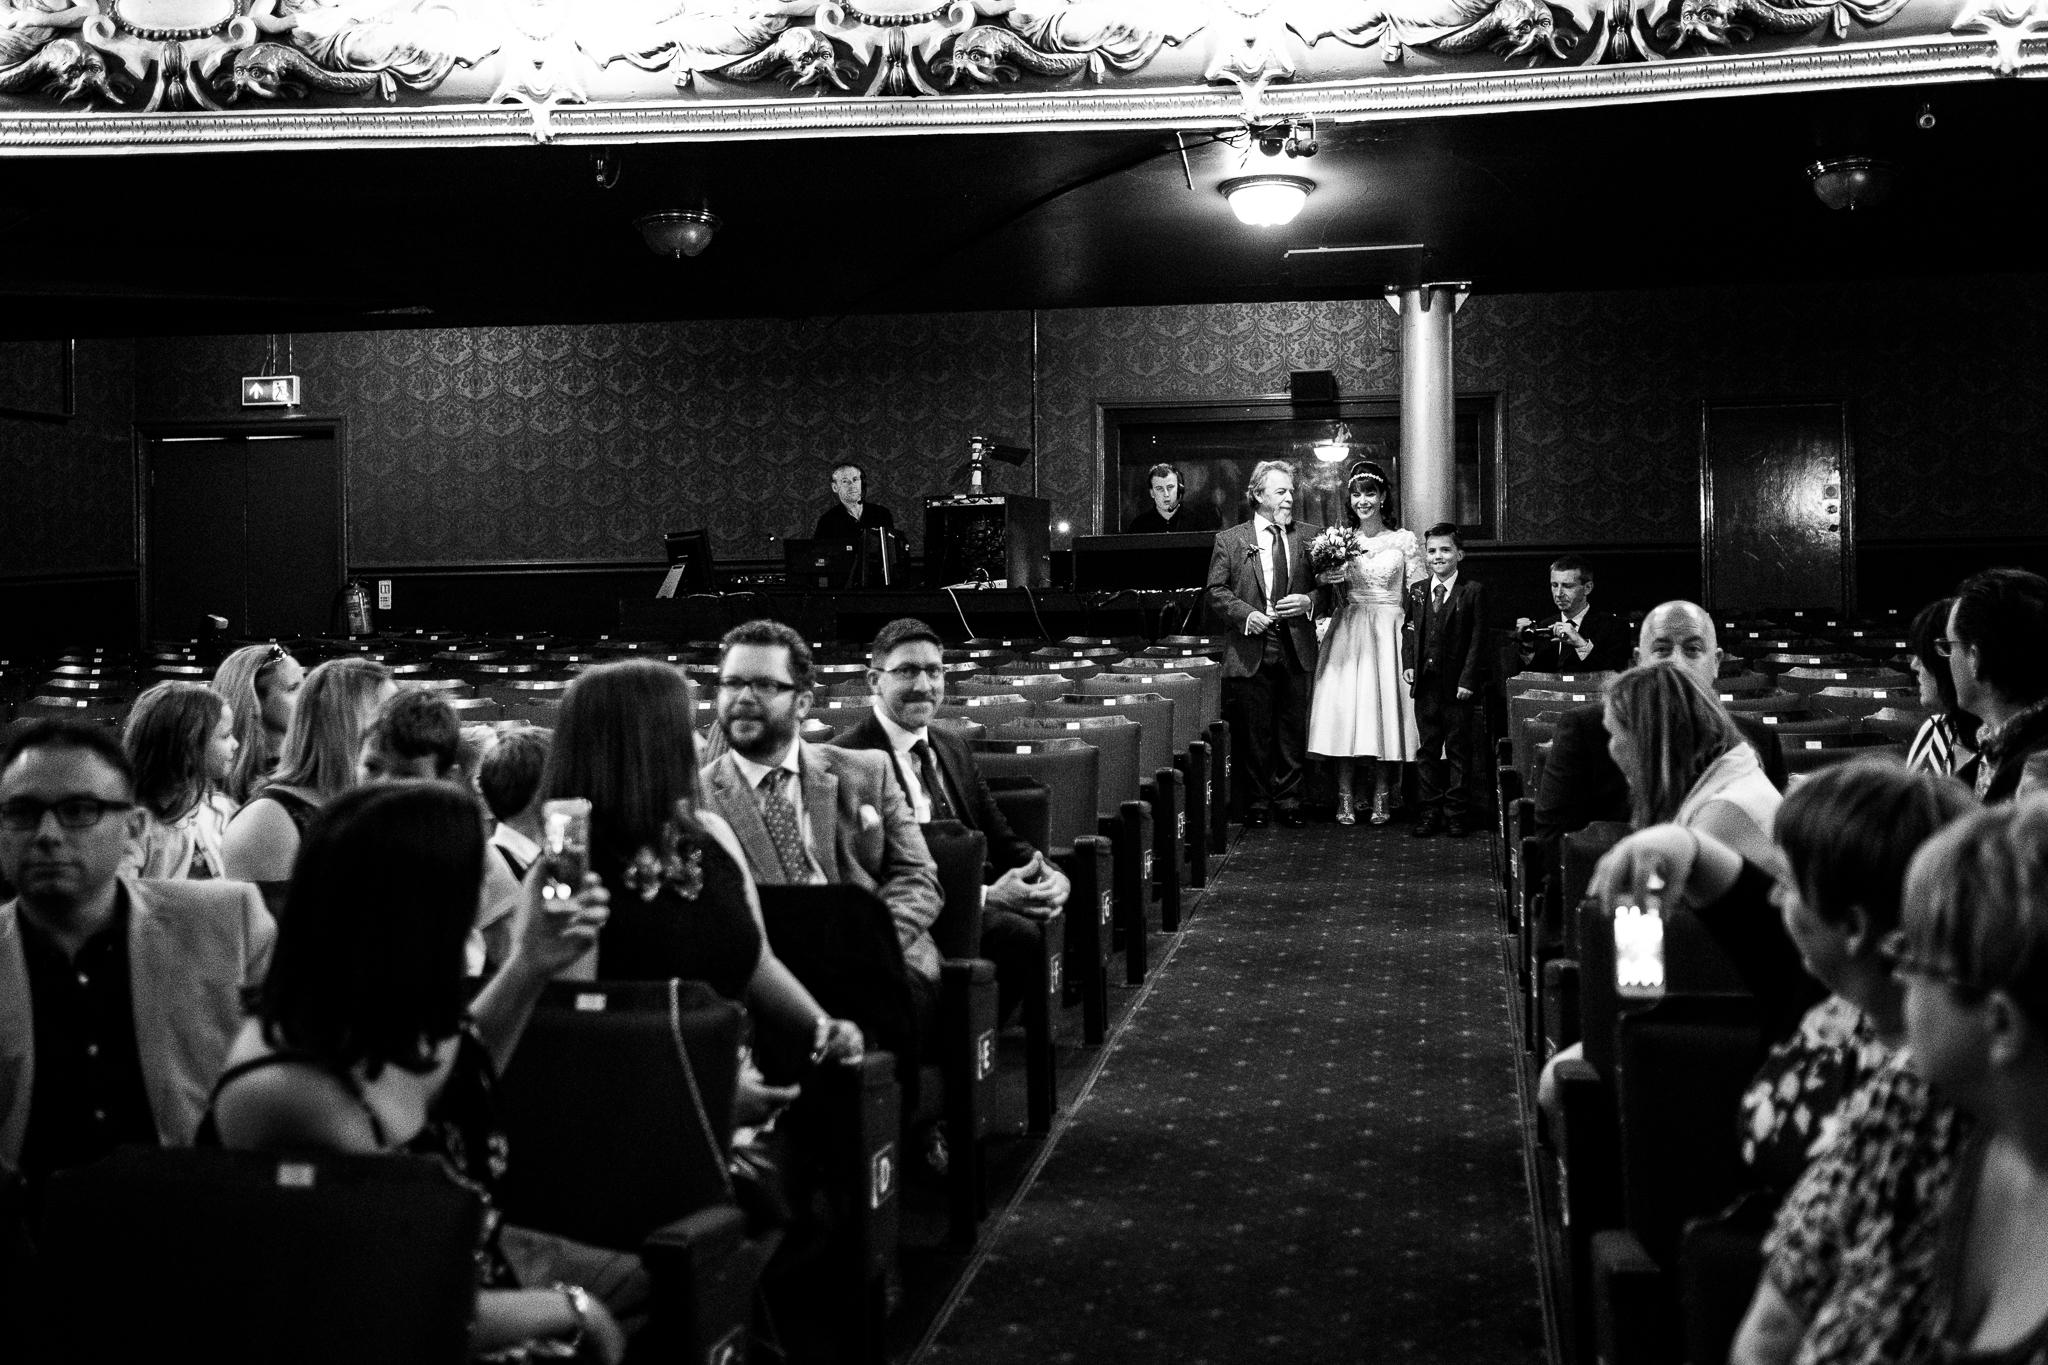 Cheshire Wedding Photography at Crewe Lyceum Theatre Stage Wedding Art Deco 20s - Jenny Harper-15.jpg